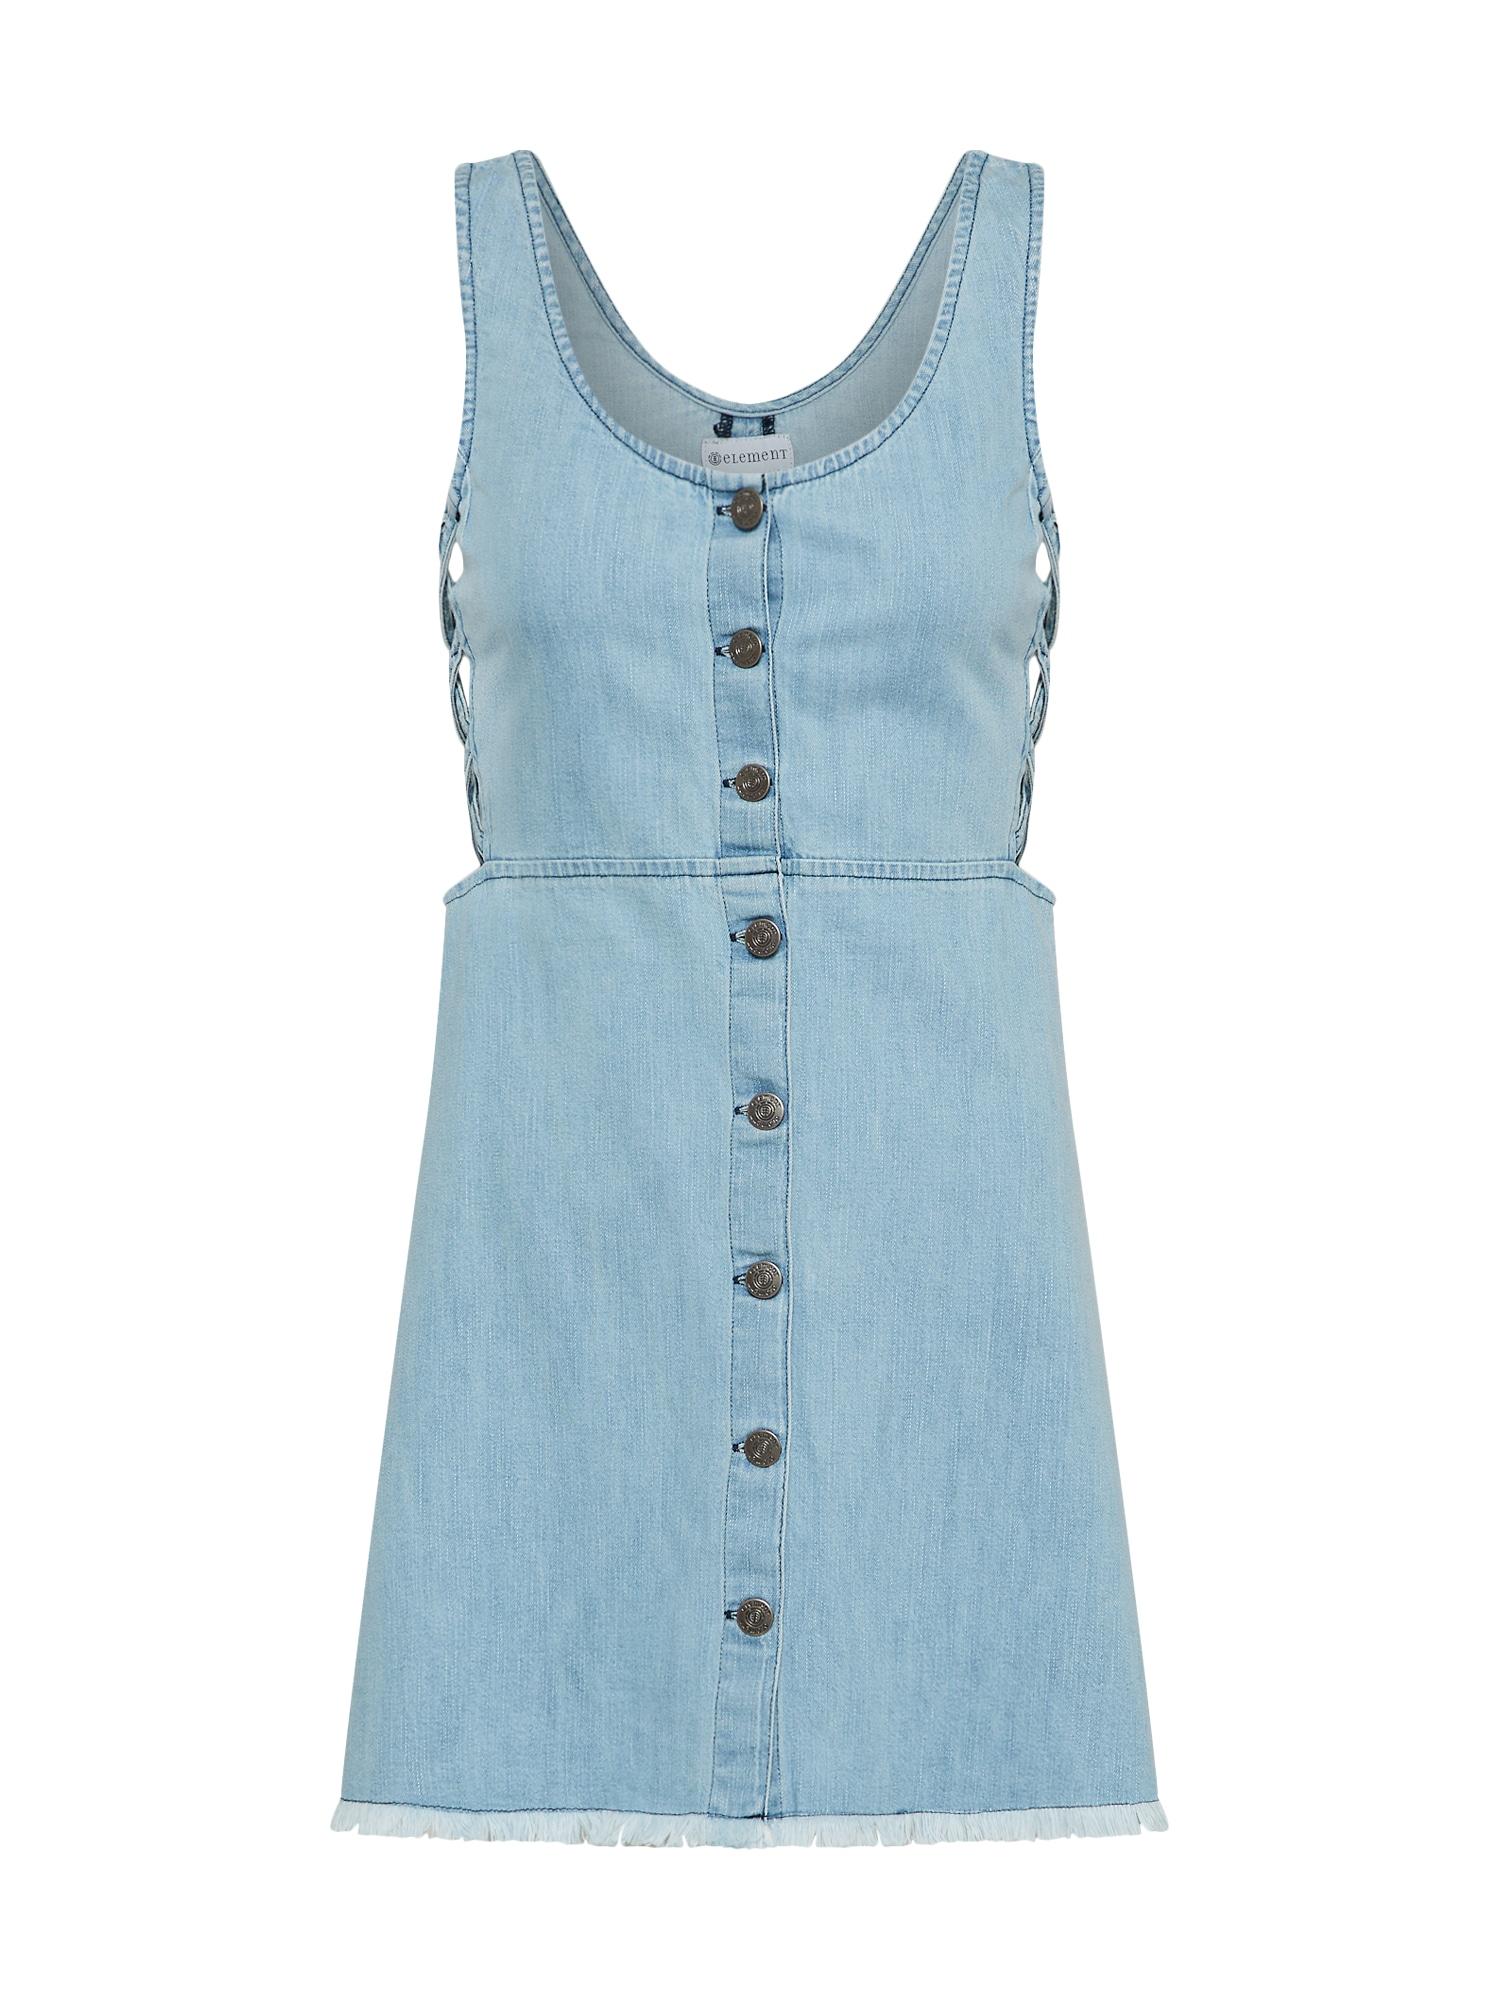 Letní šaty PARK indigo ELEMENT